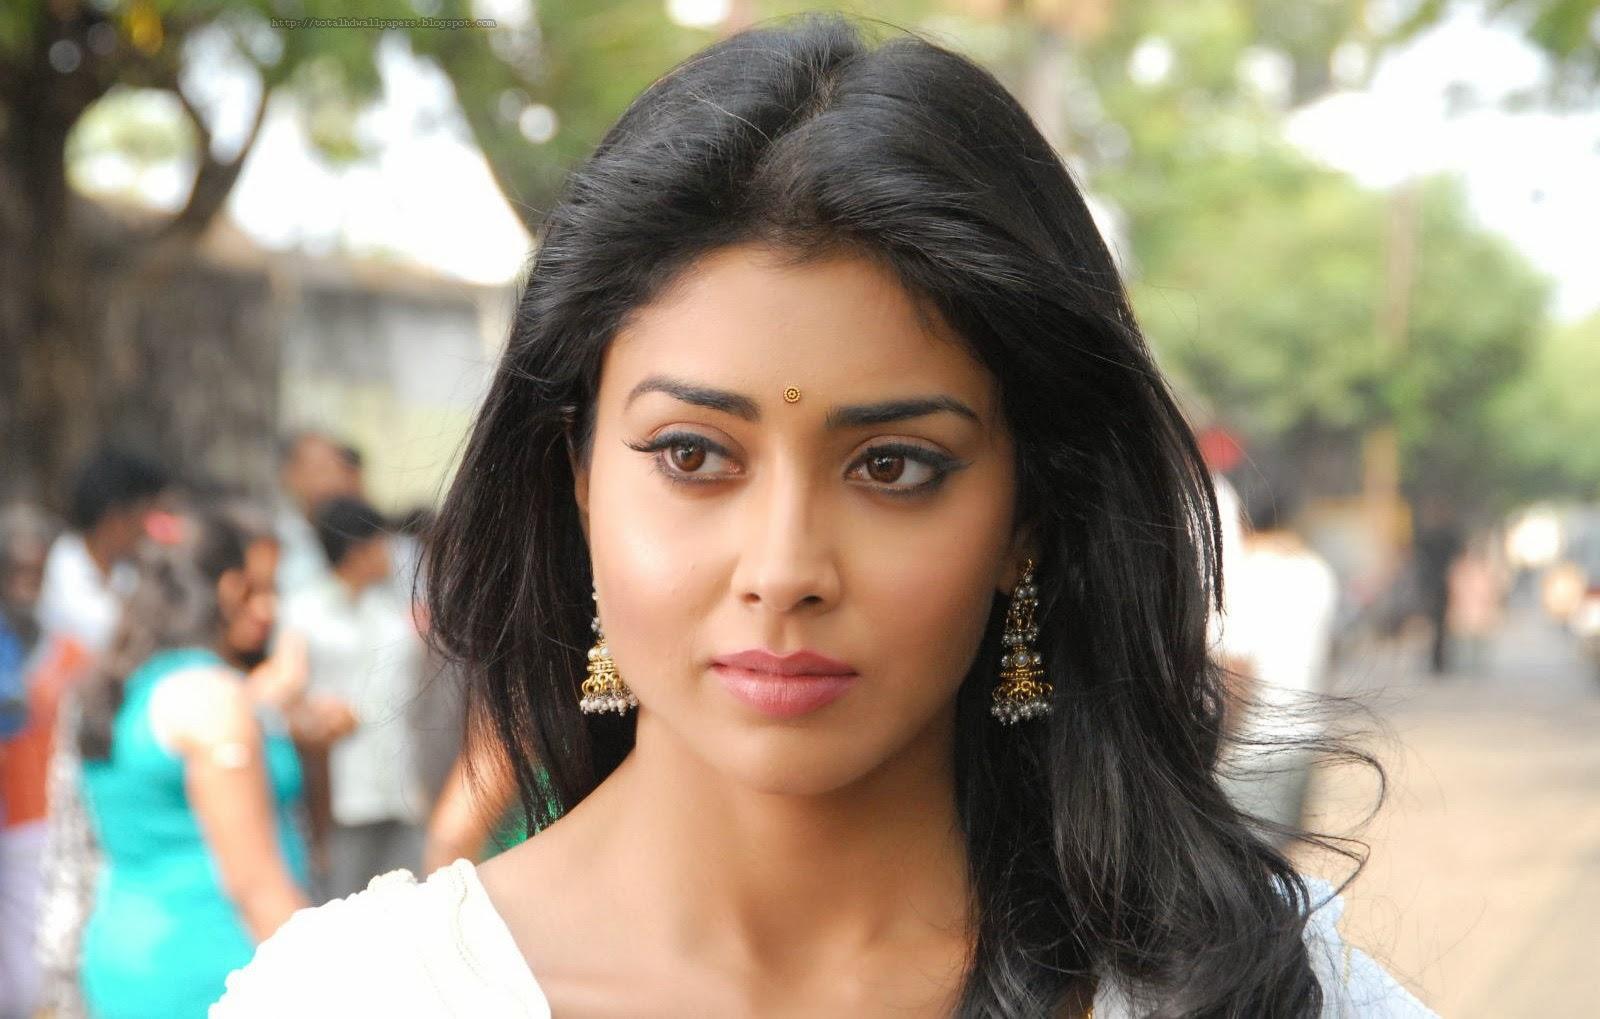 Bollywood hd wallpapers 1080p shriya saran hd wallpapers - Telugu hd wallpaper ...